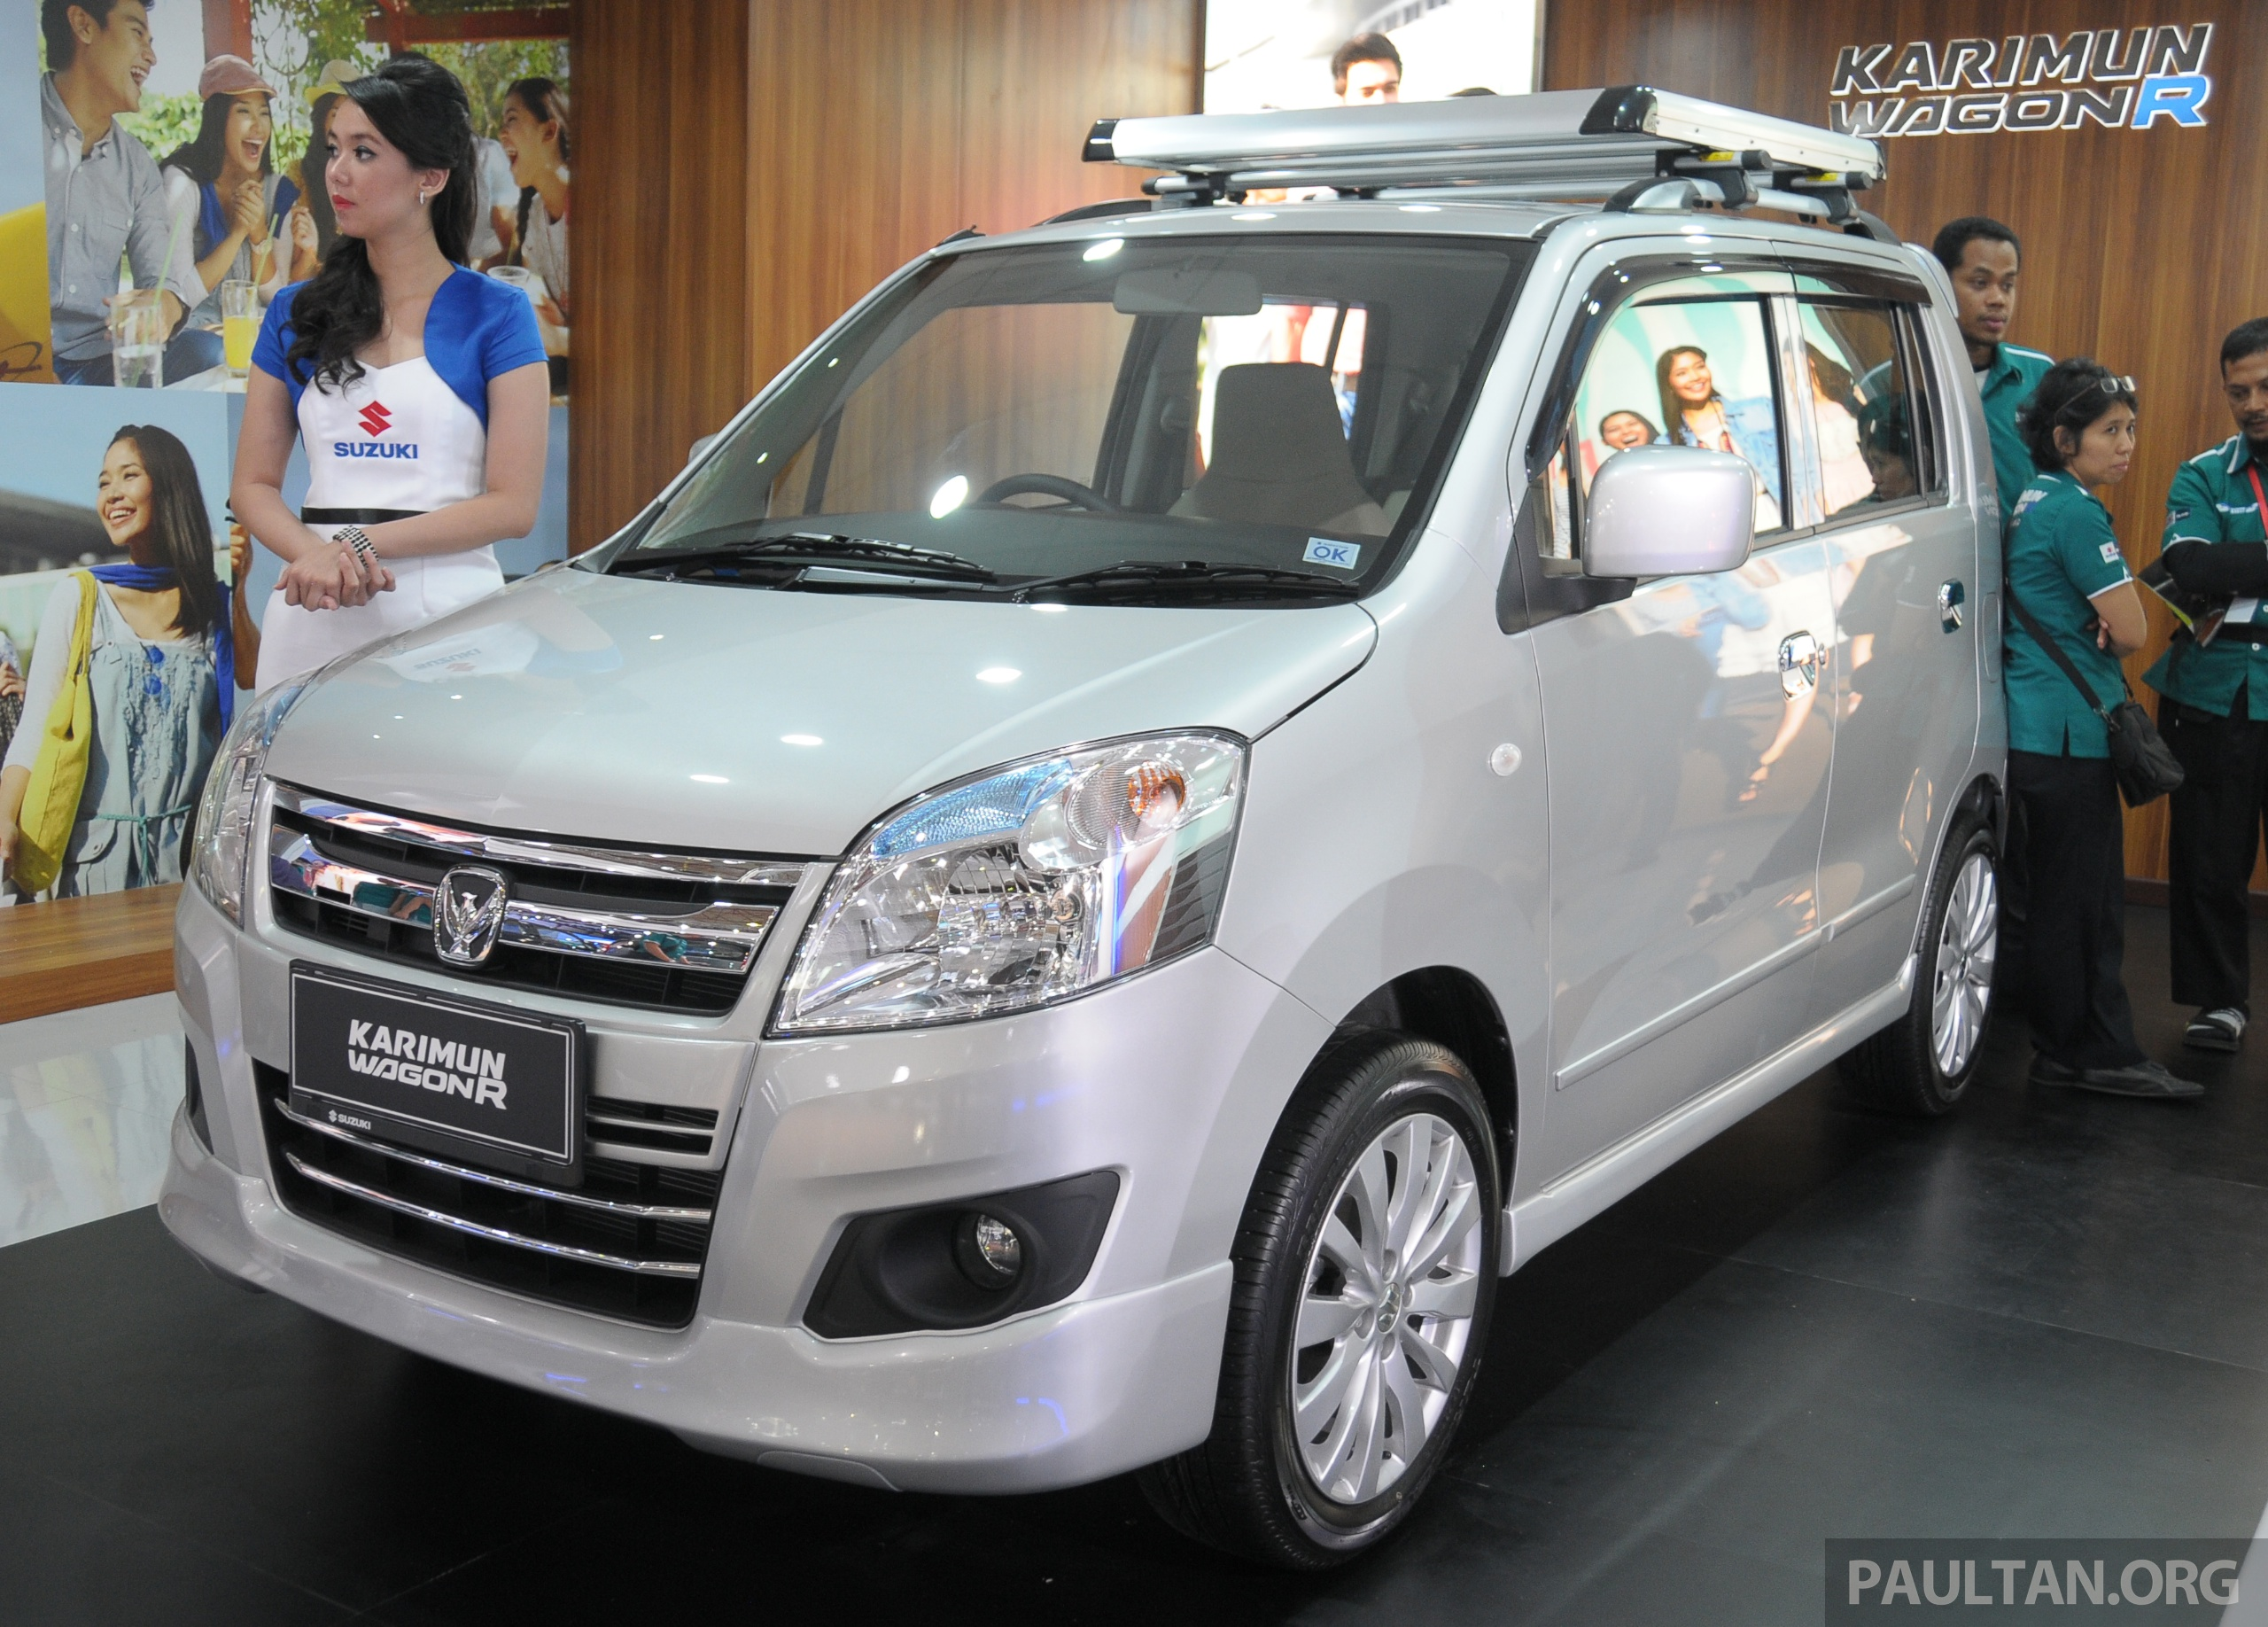 New Suzuki Karimun Wagon R And Stingray At IIMS Image 199936